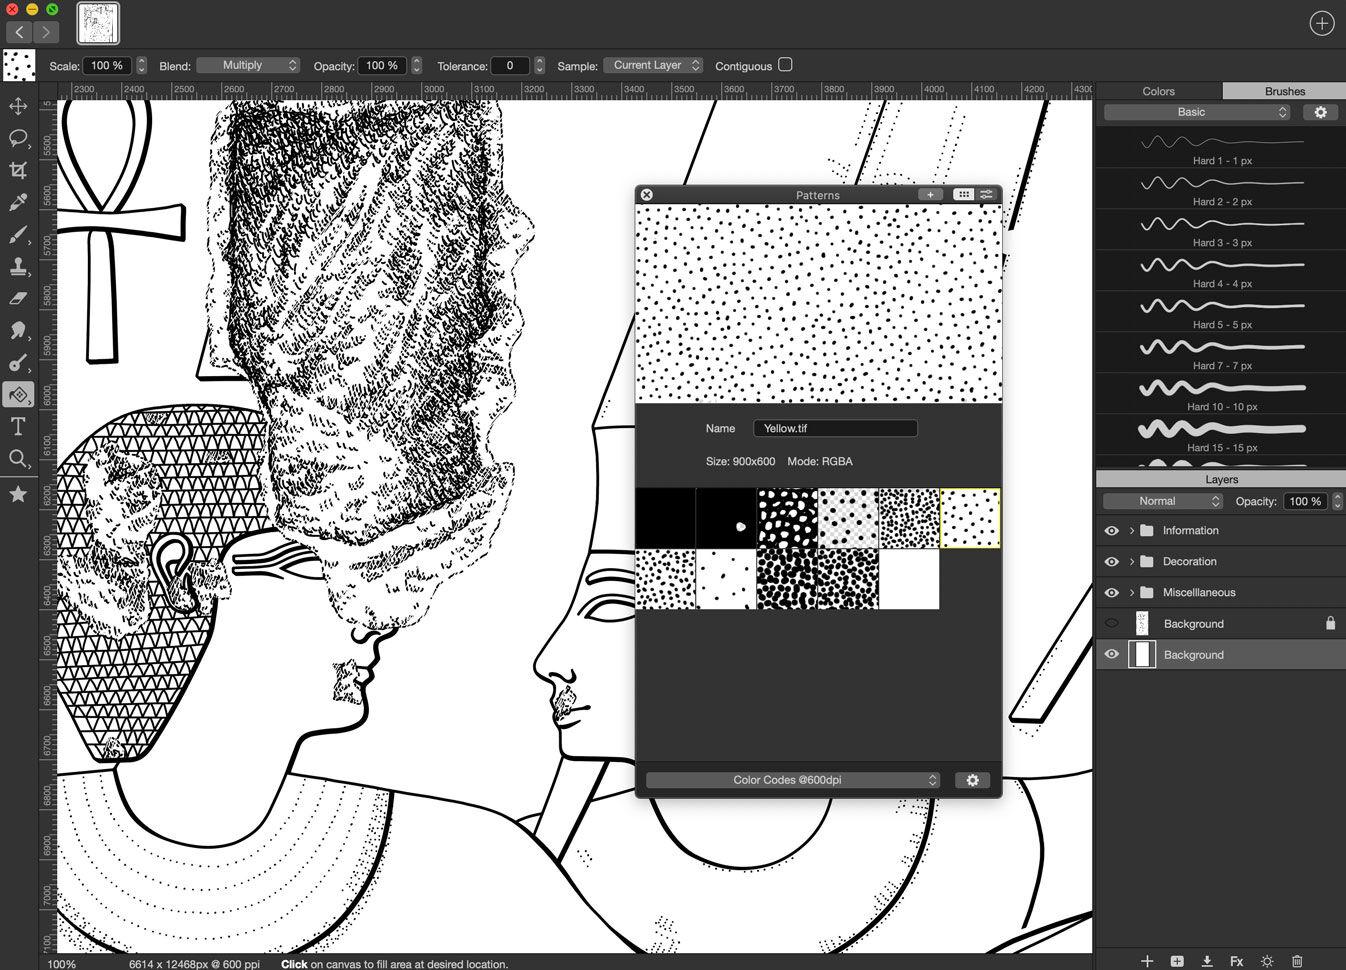 Artstudio Pro by Lucky Clan – a cheap Photoshop/Procreate